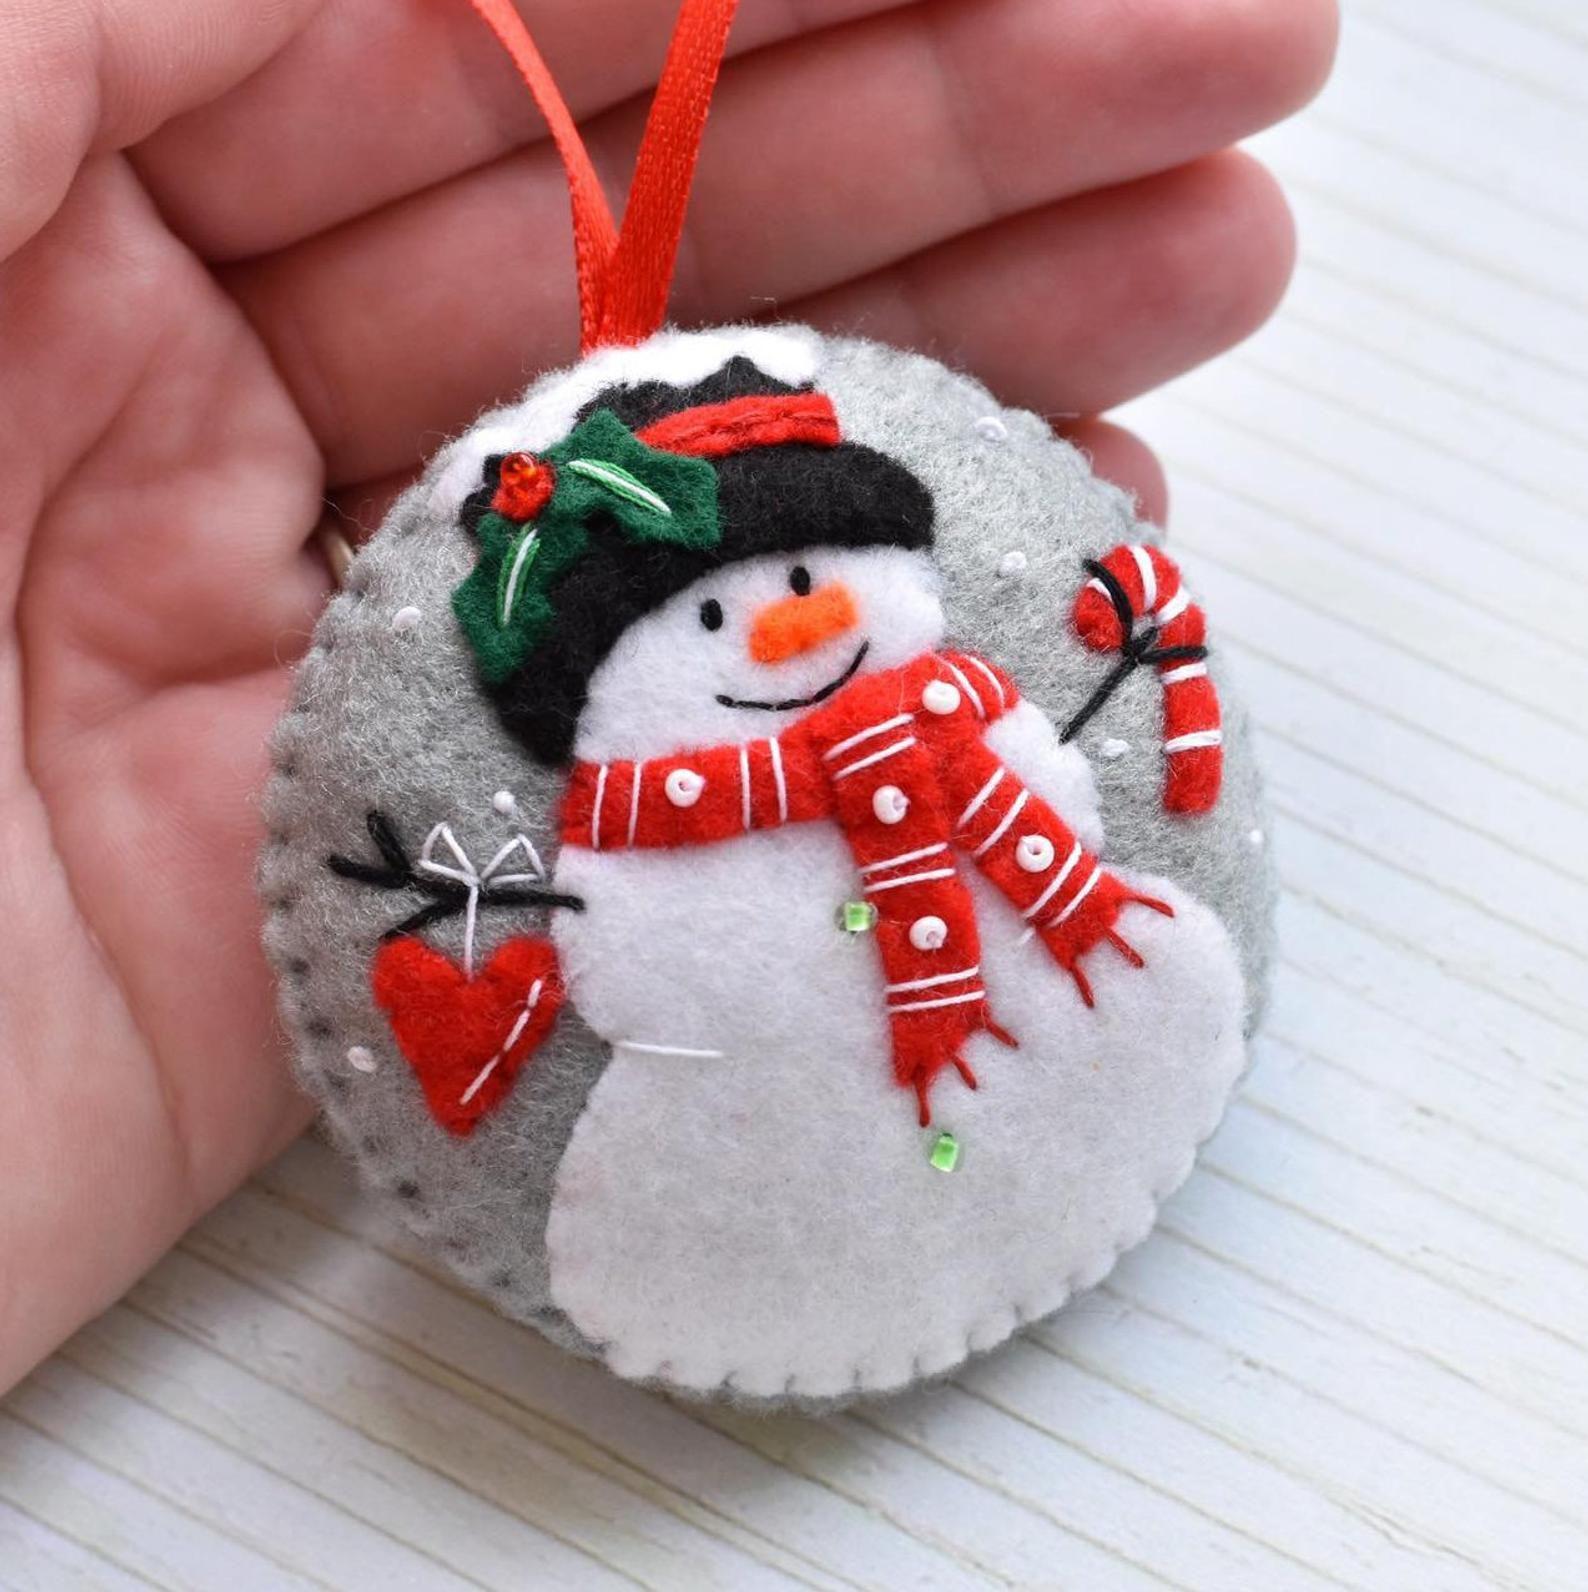 Felt Snowman Snowman Decoration Snowman Christmas Ornament Etsy Handmade Felt Ornament Diy Felt Christmas Ornaments Felt Crafts Christmas